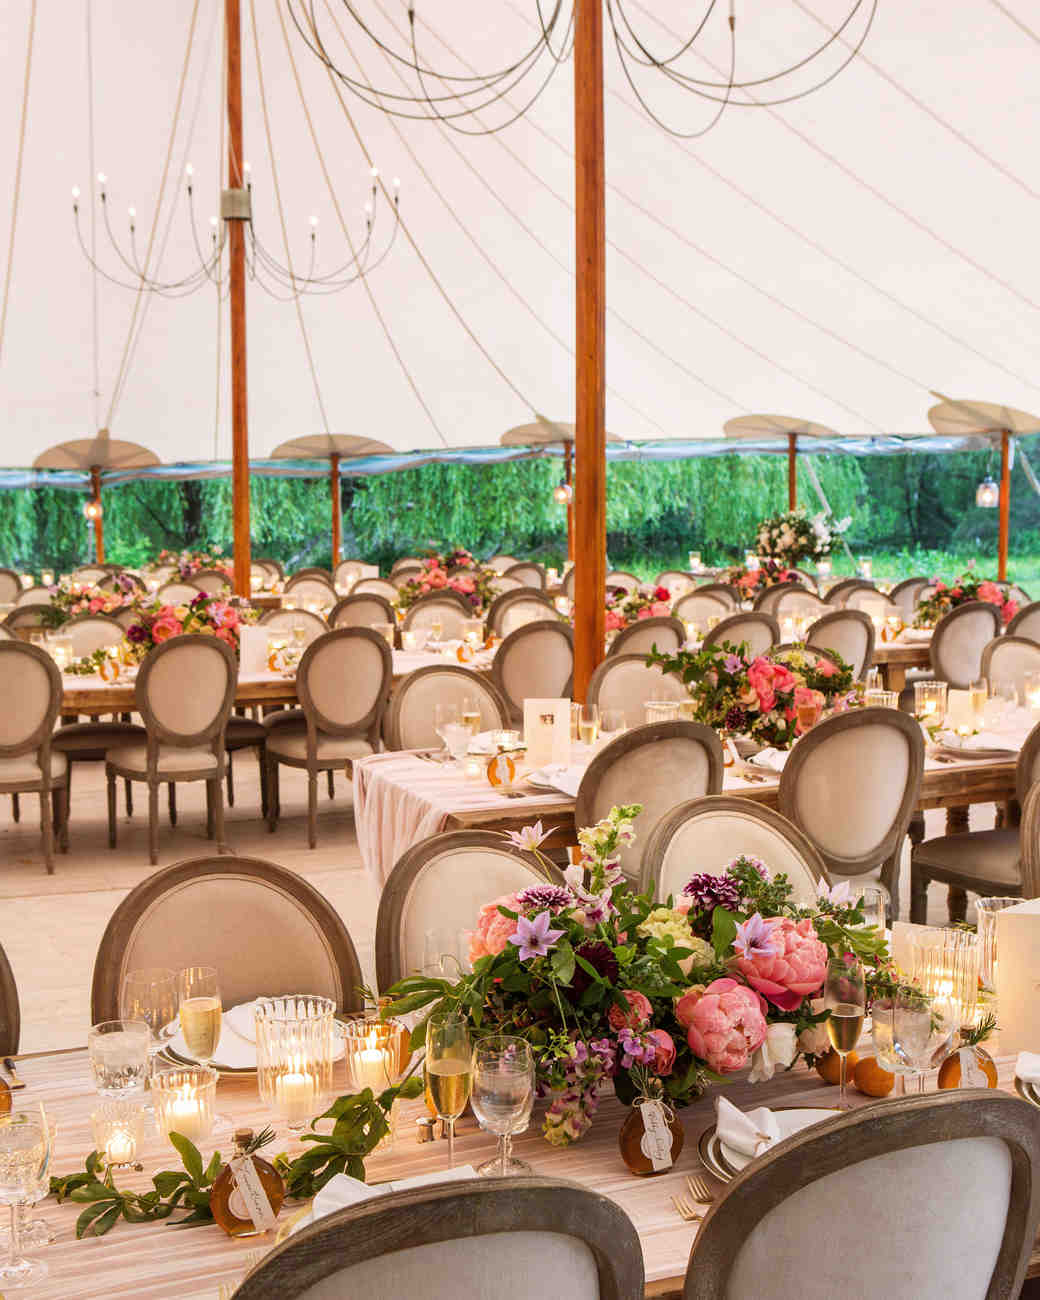 kaitlyn-robert-wedding-tent-0134-s112718-0316.jpg